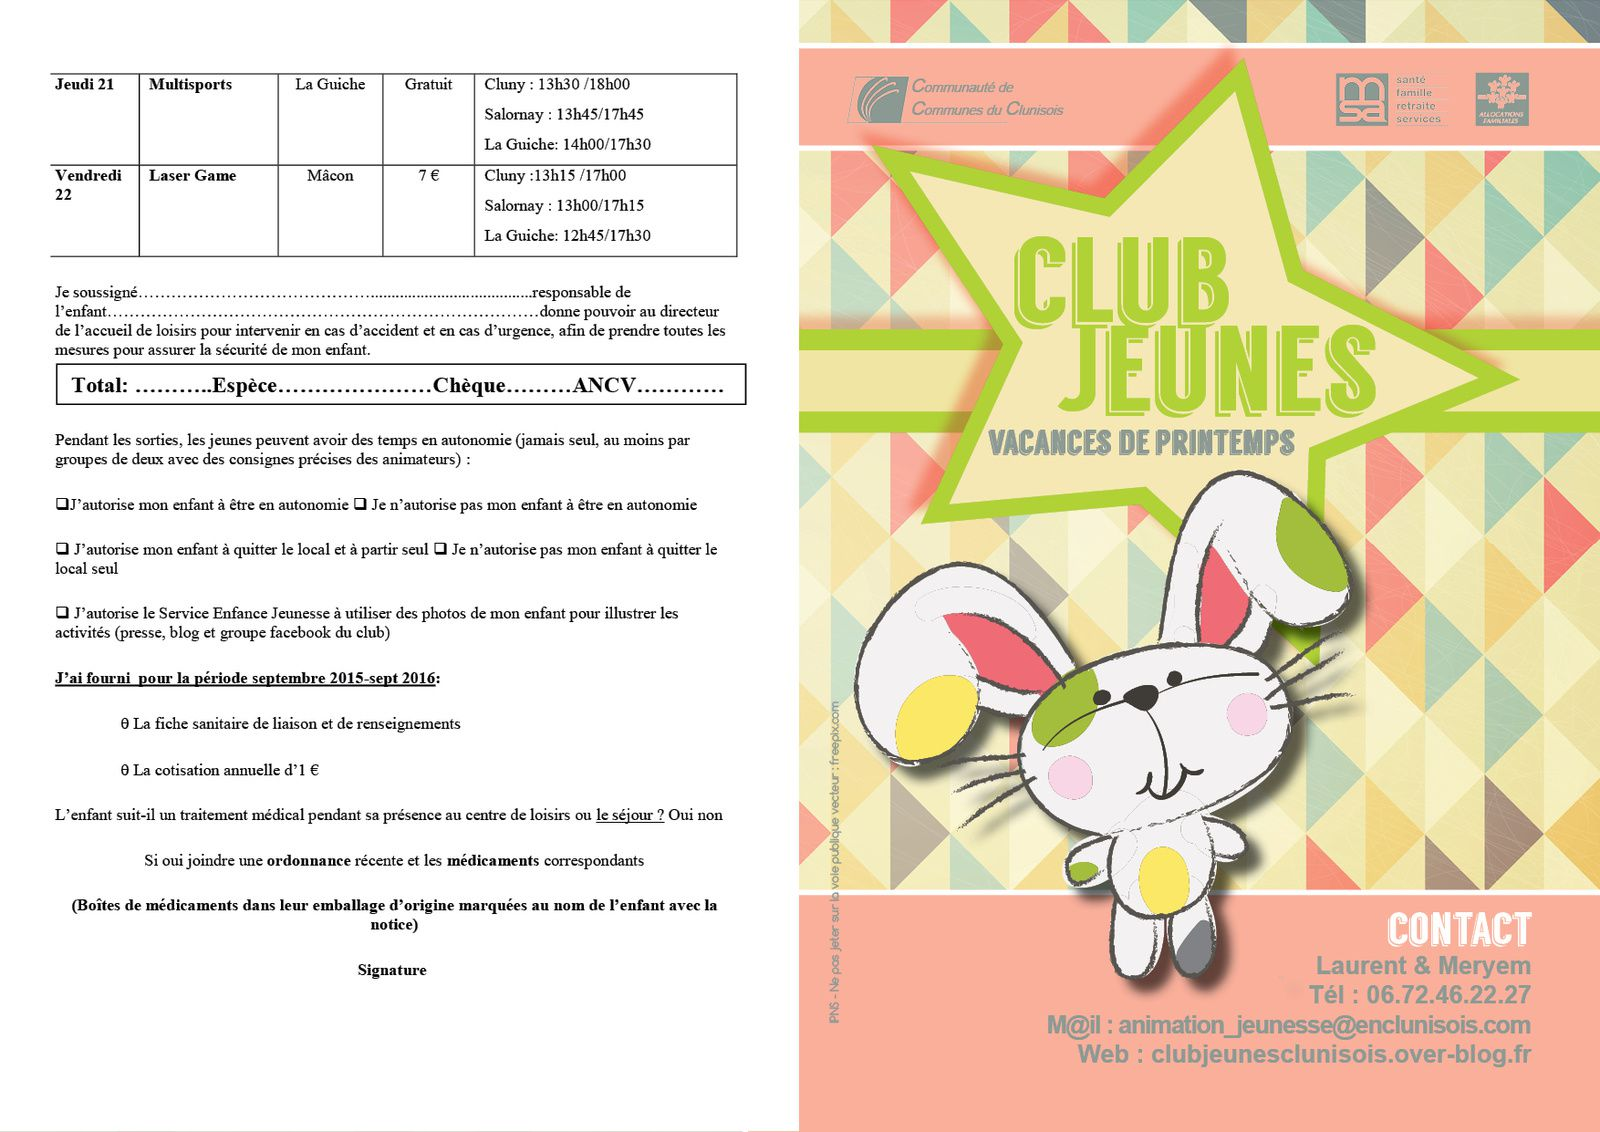 Vacances Printemps 2016